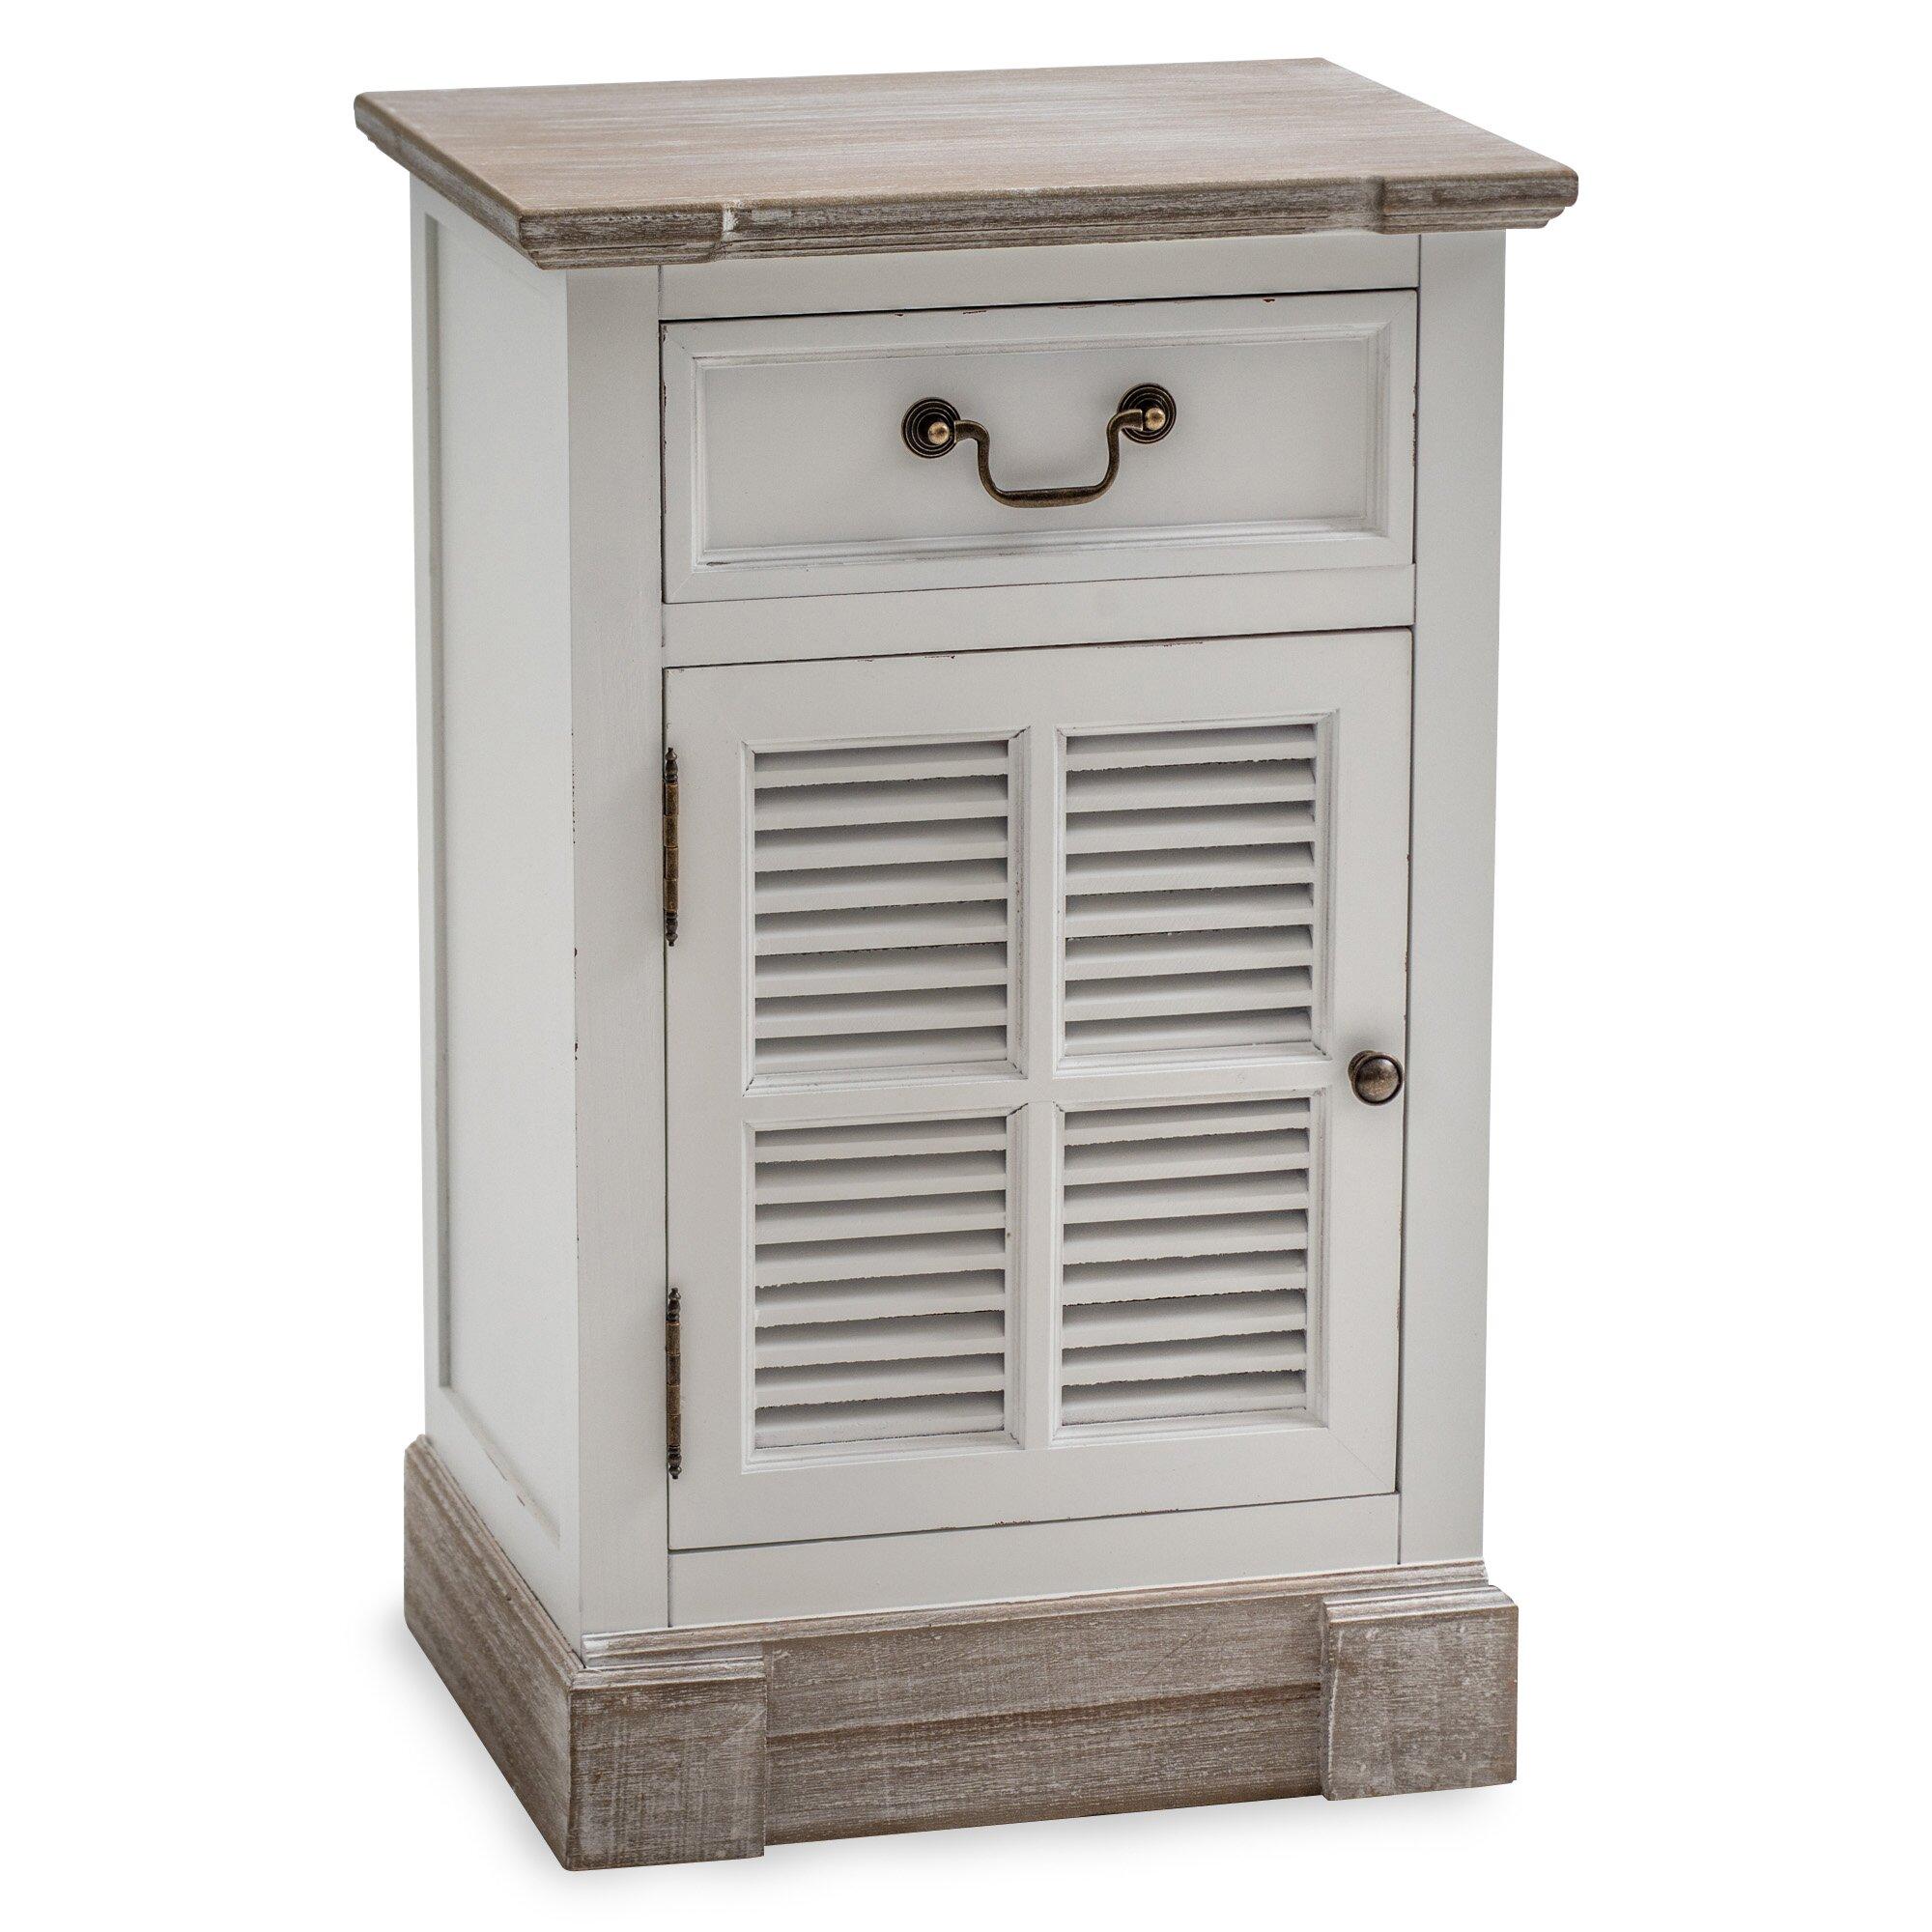 Maine furniture co new england 1 drawer bedside table for 1 drawer bedside table